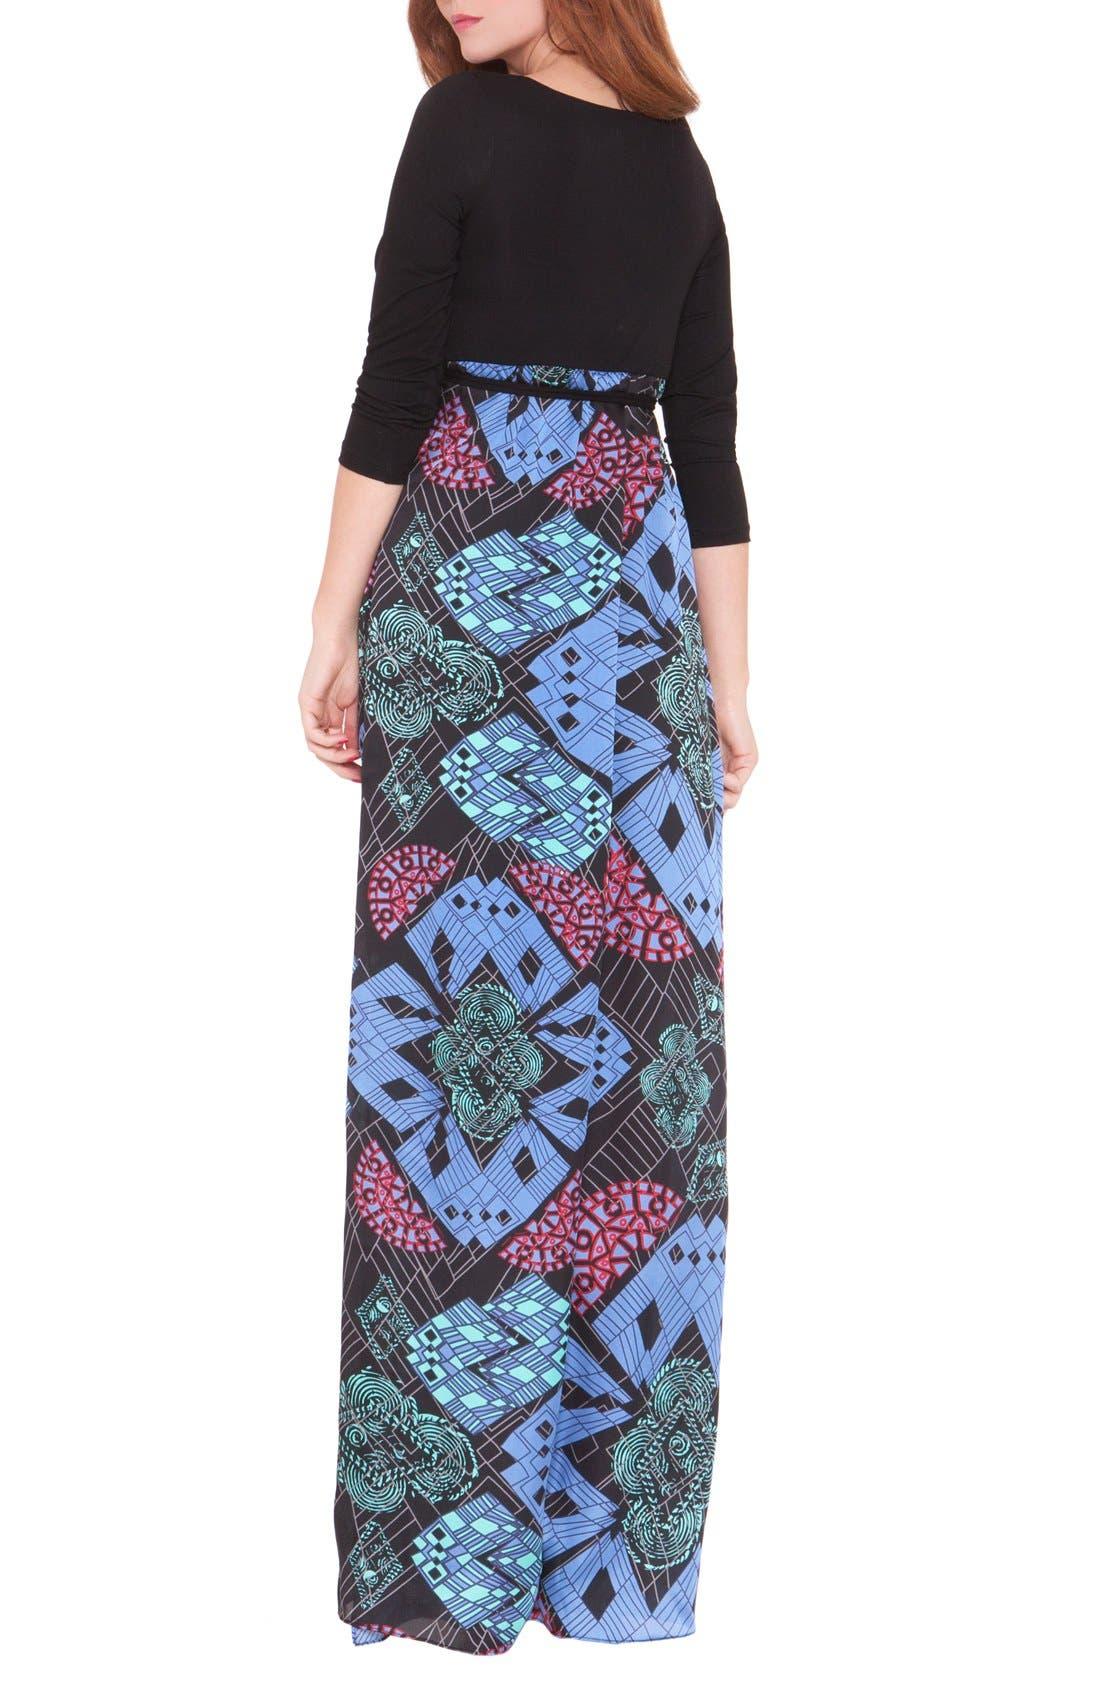 'Samantha' Maternity Maxi Dress,                             Alternate thumbnail 3, color,                             BLUE